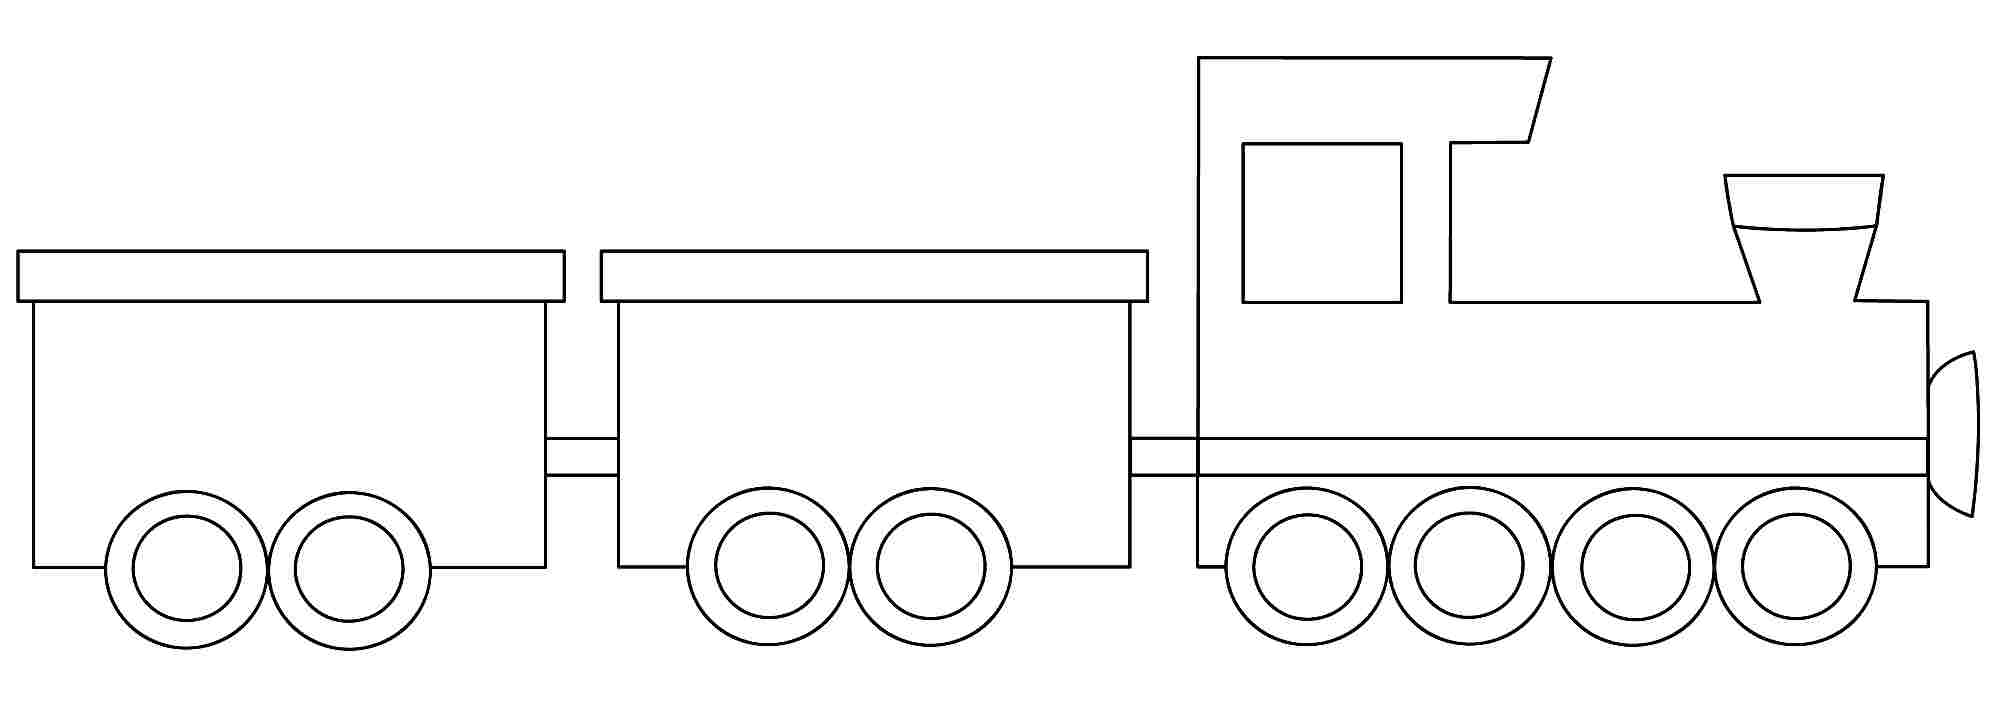 train templates train car template printable free printable train